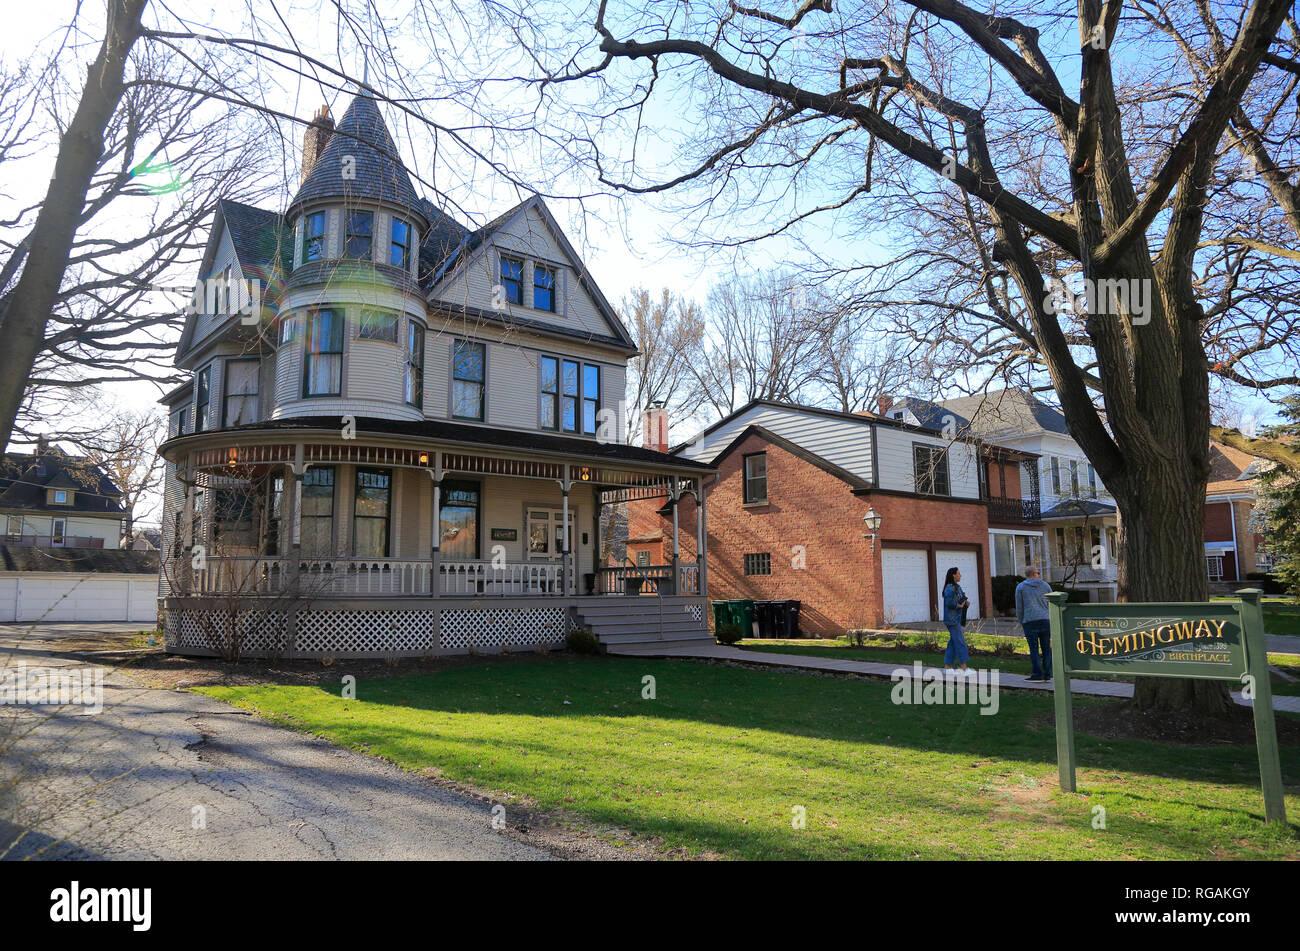 Ernest Hemingway's birthplace at 339 N. Oak Park Avenue.Oak Park. West of Chicago. Illinois. USA Stock Photo